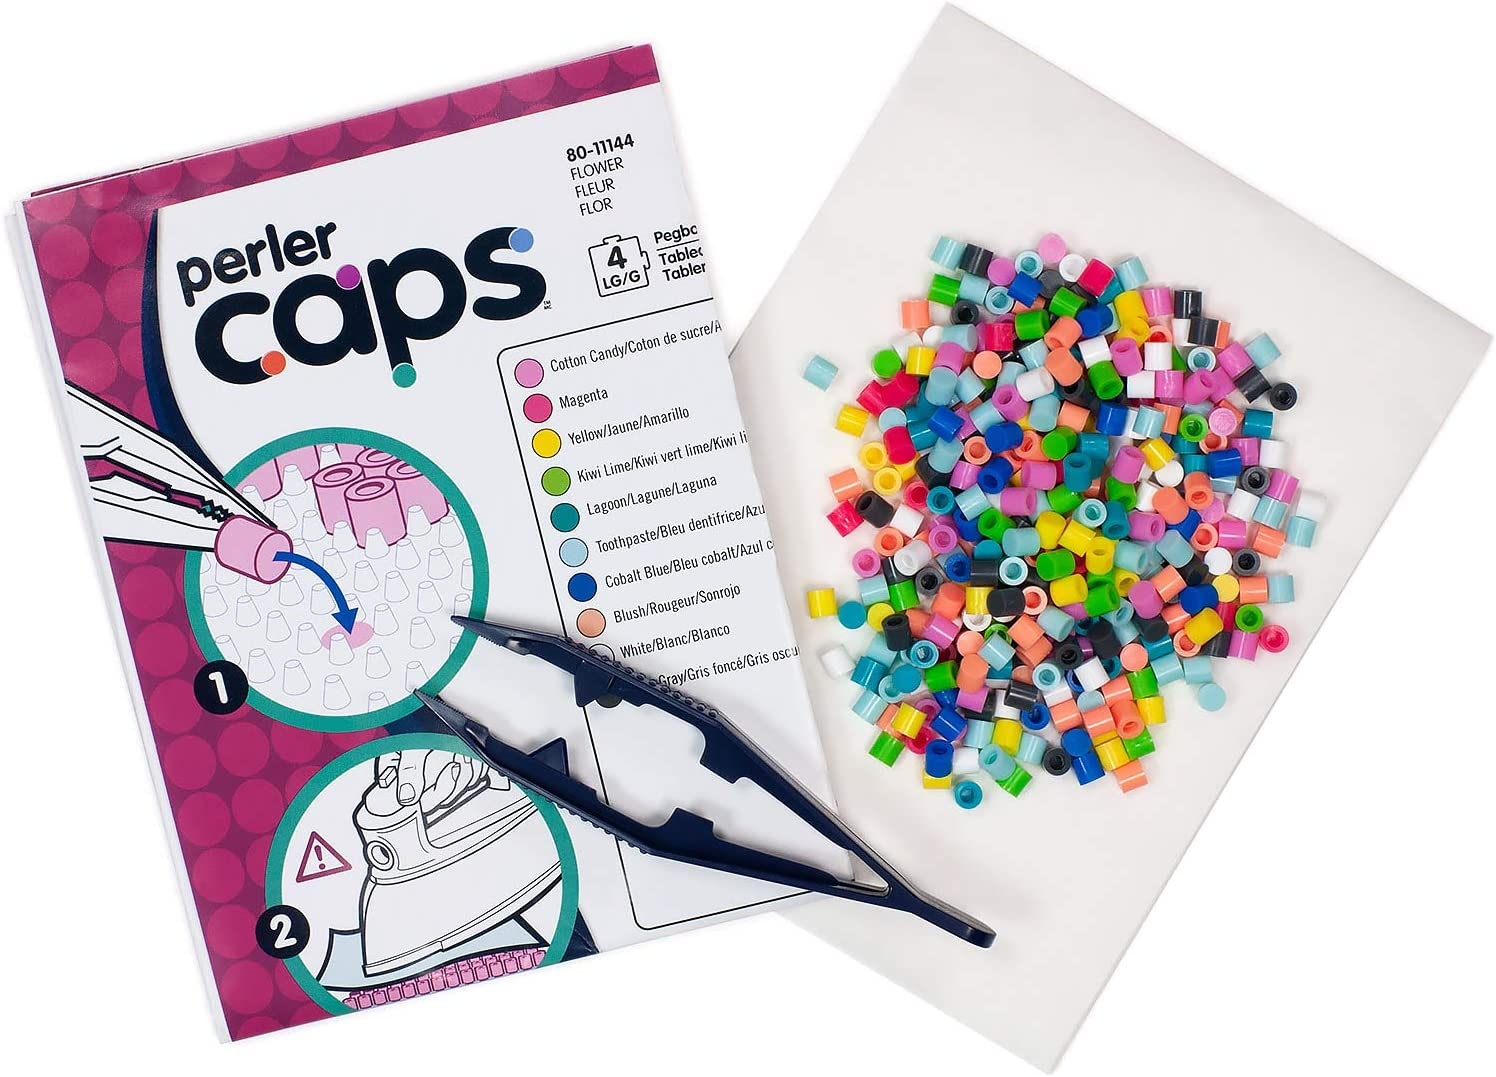 Flower Pattern Kit Perler 80-11144 Solid-Top Cap Fuse Beads 3505pcs